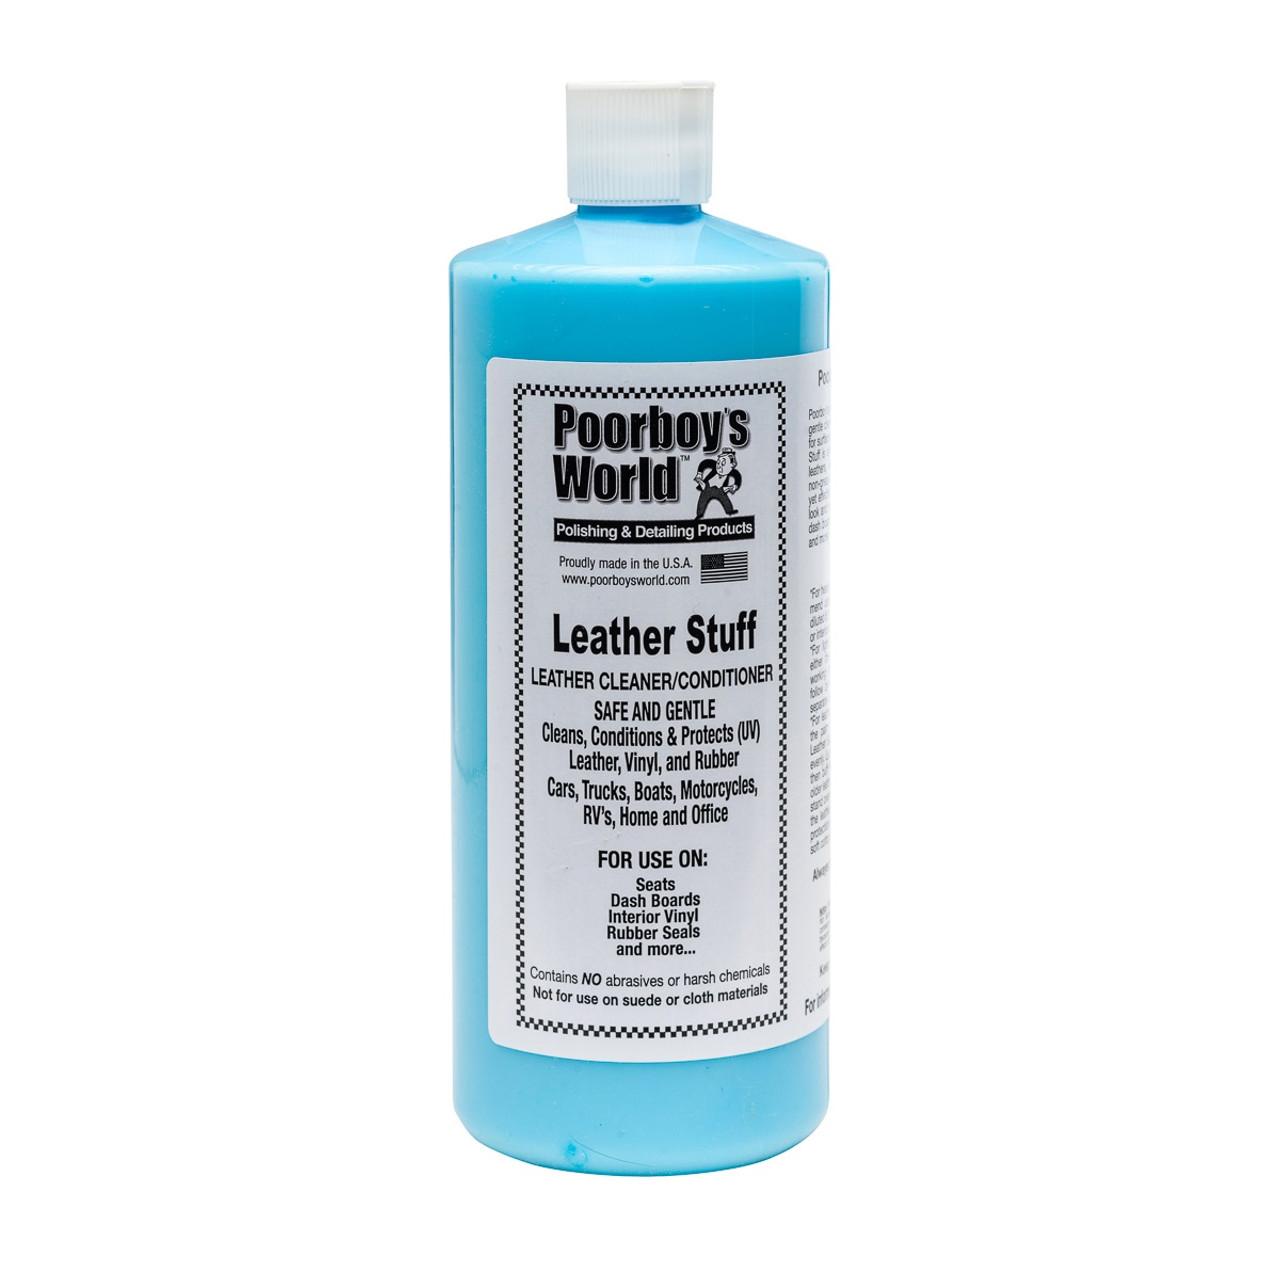 Poorboy's World Leather Stuff 32oz